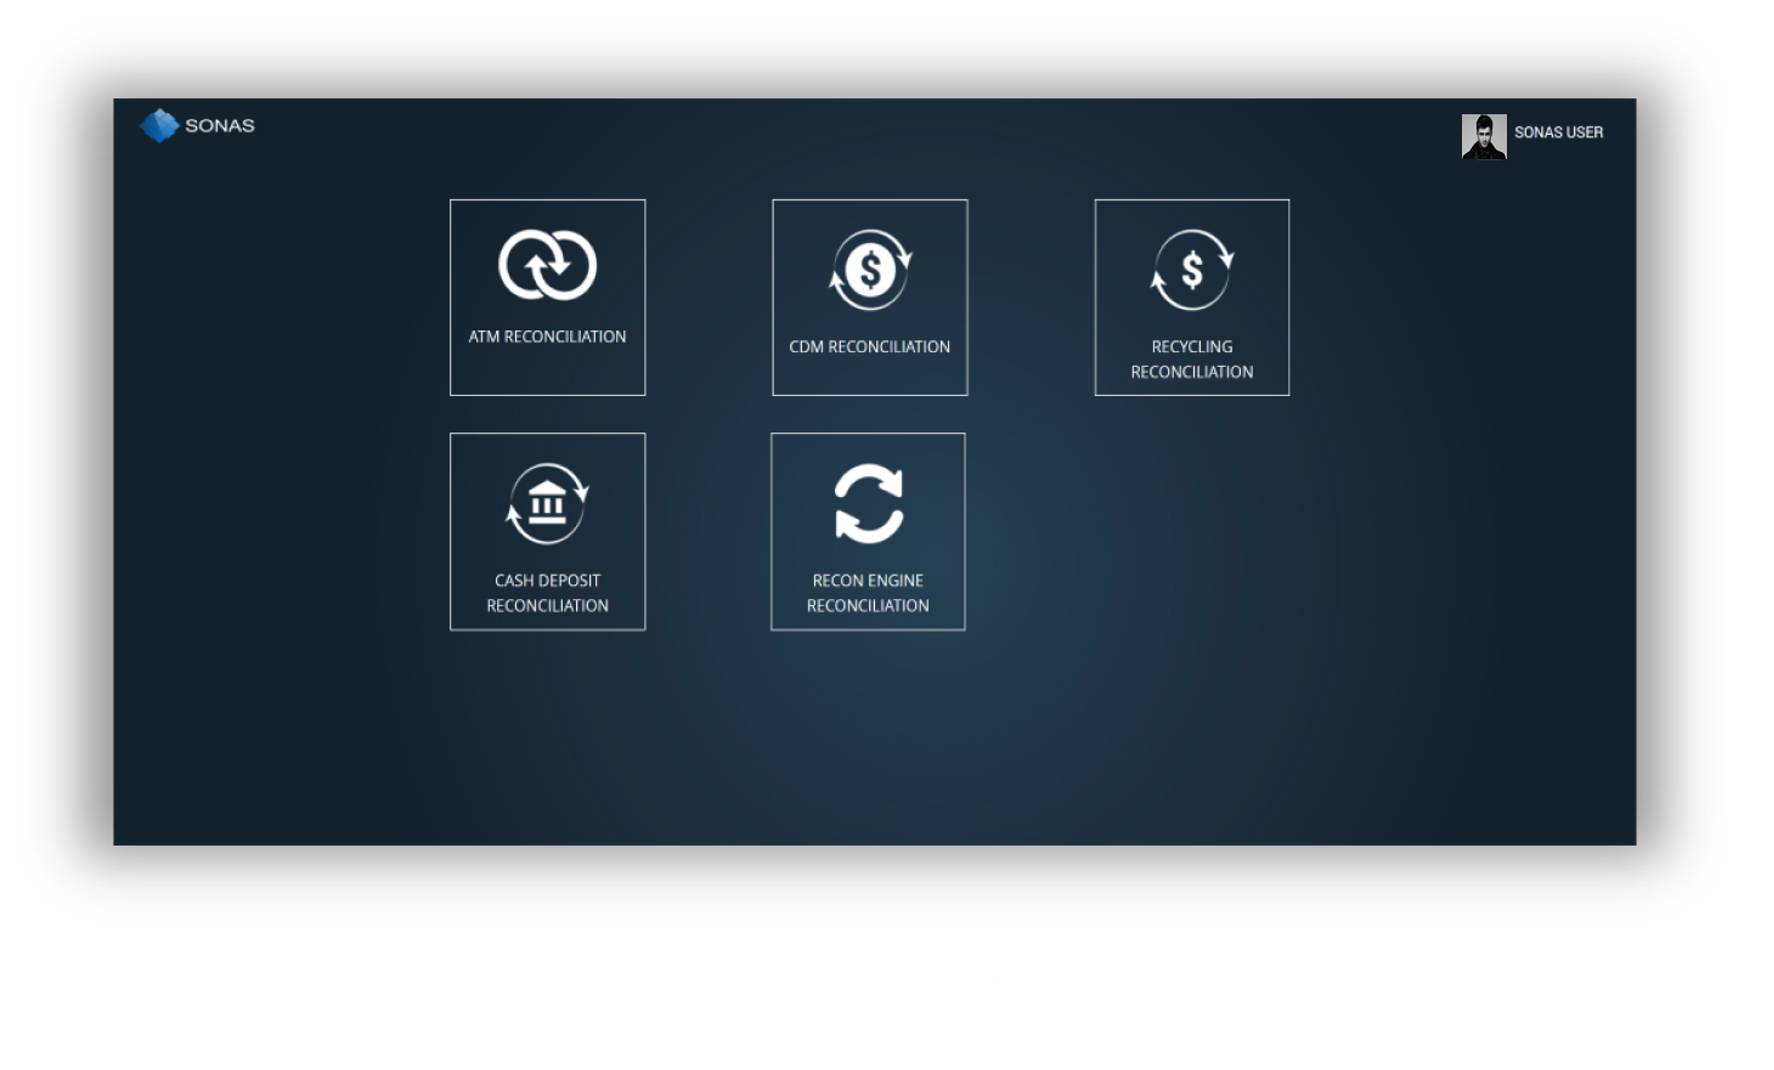 Reconciliation Data